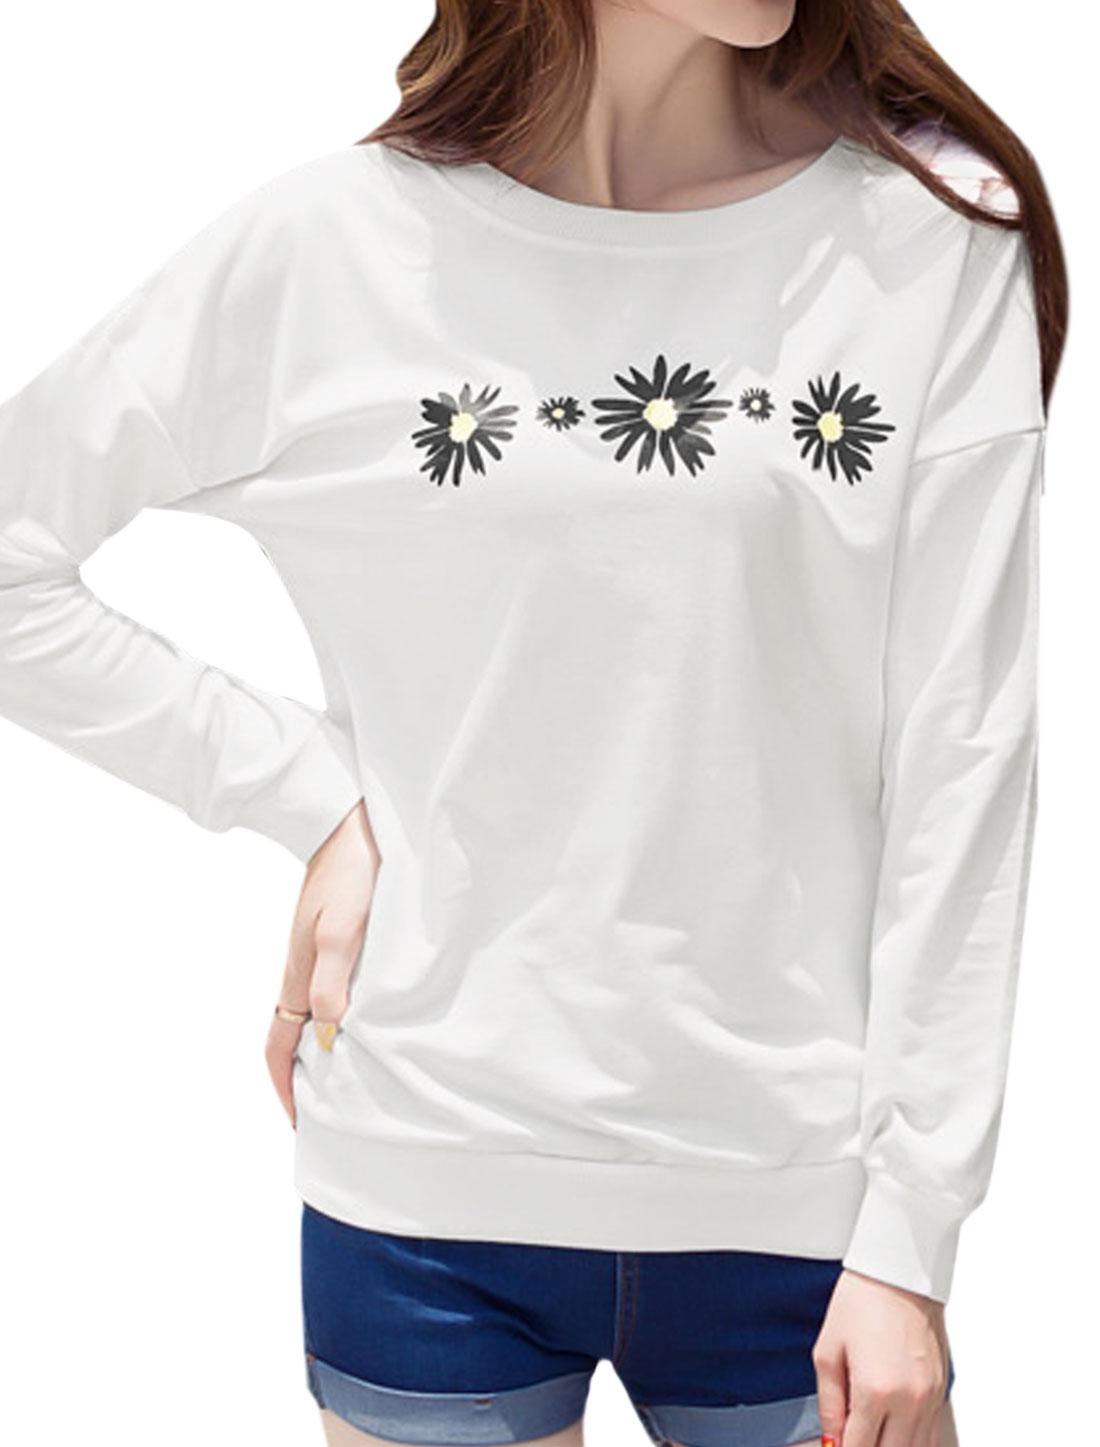 Women Long Sleeves Round Neck Floral Prints Sweatshirt White M